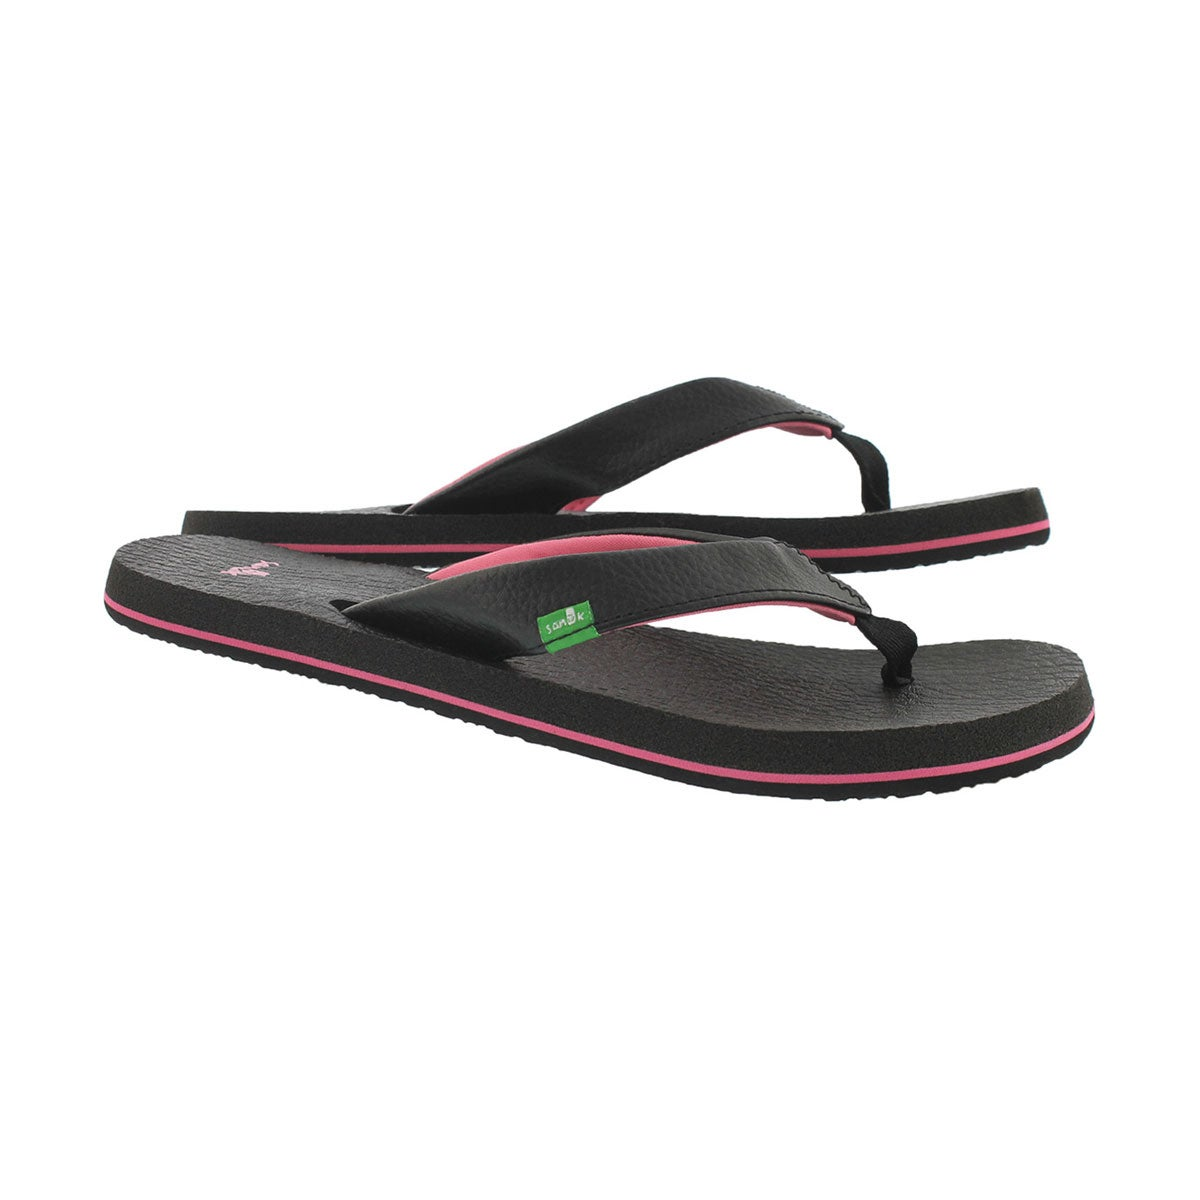 Grls Yoga Mat black/pink flip flop